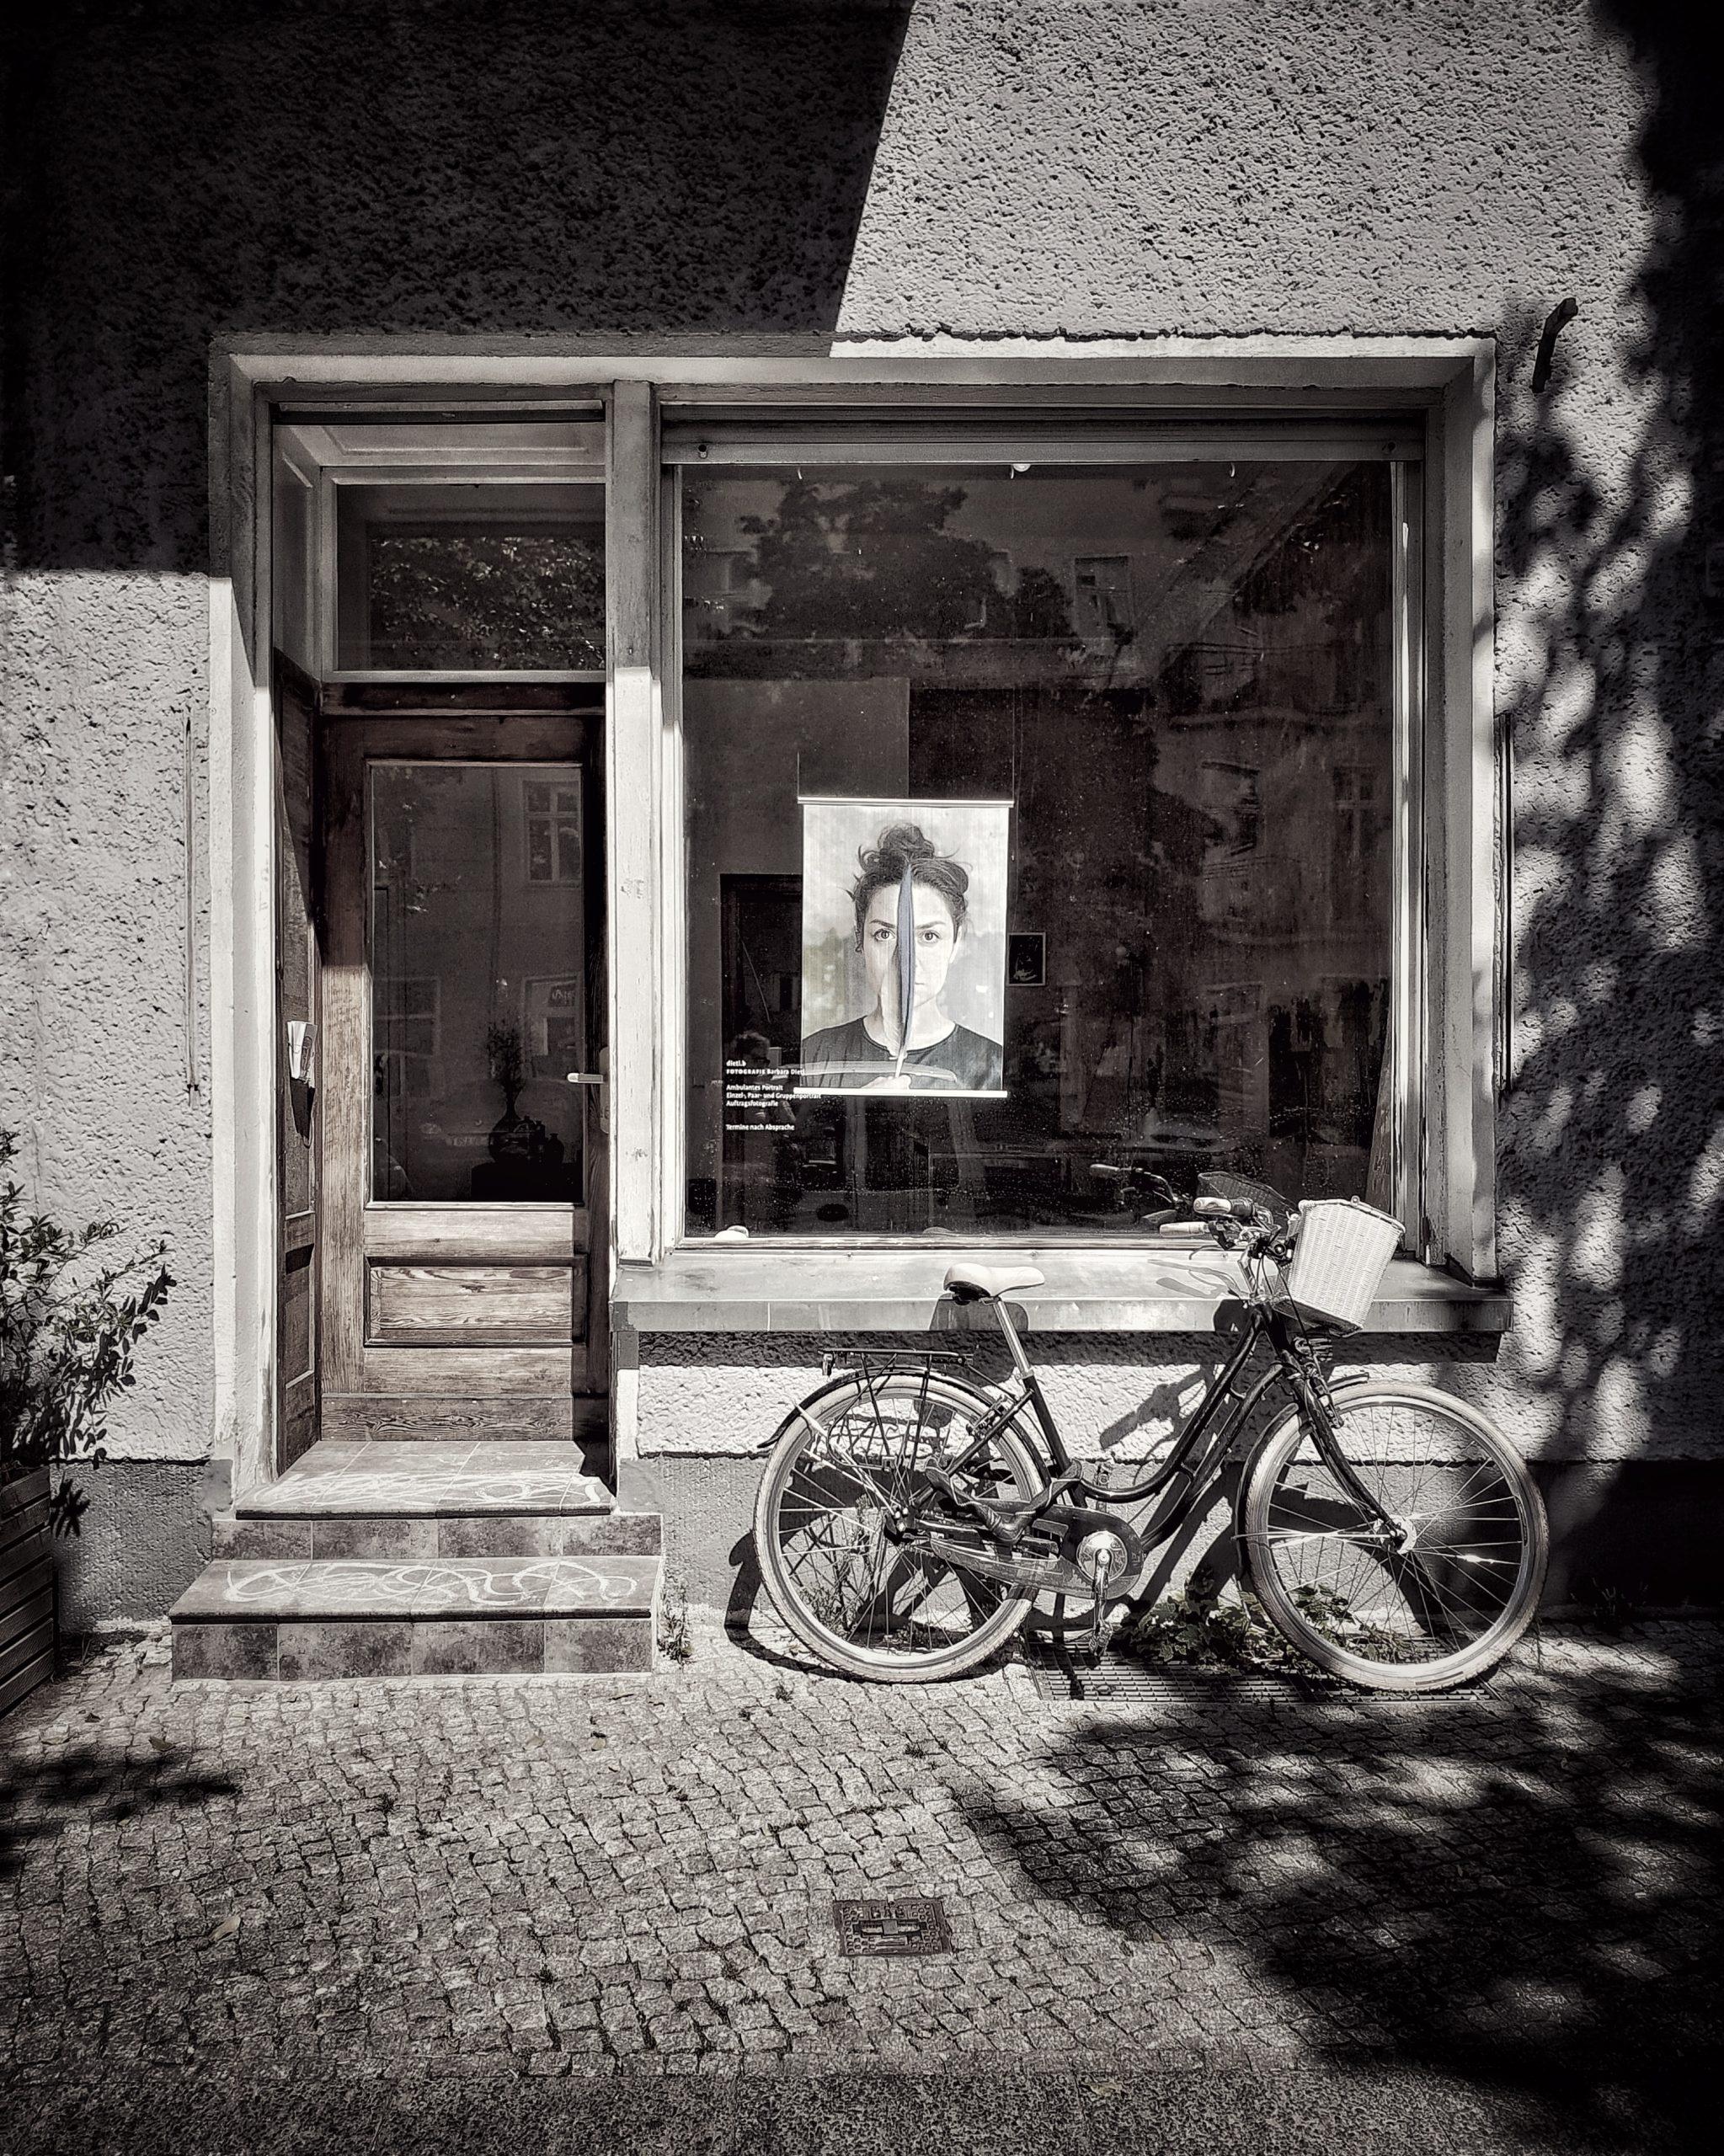 Fensterln, Berlin, Studio B. Dietl   Anne Seubert